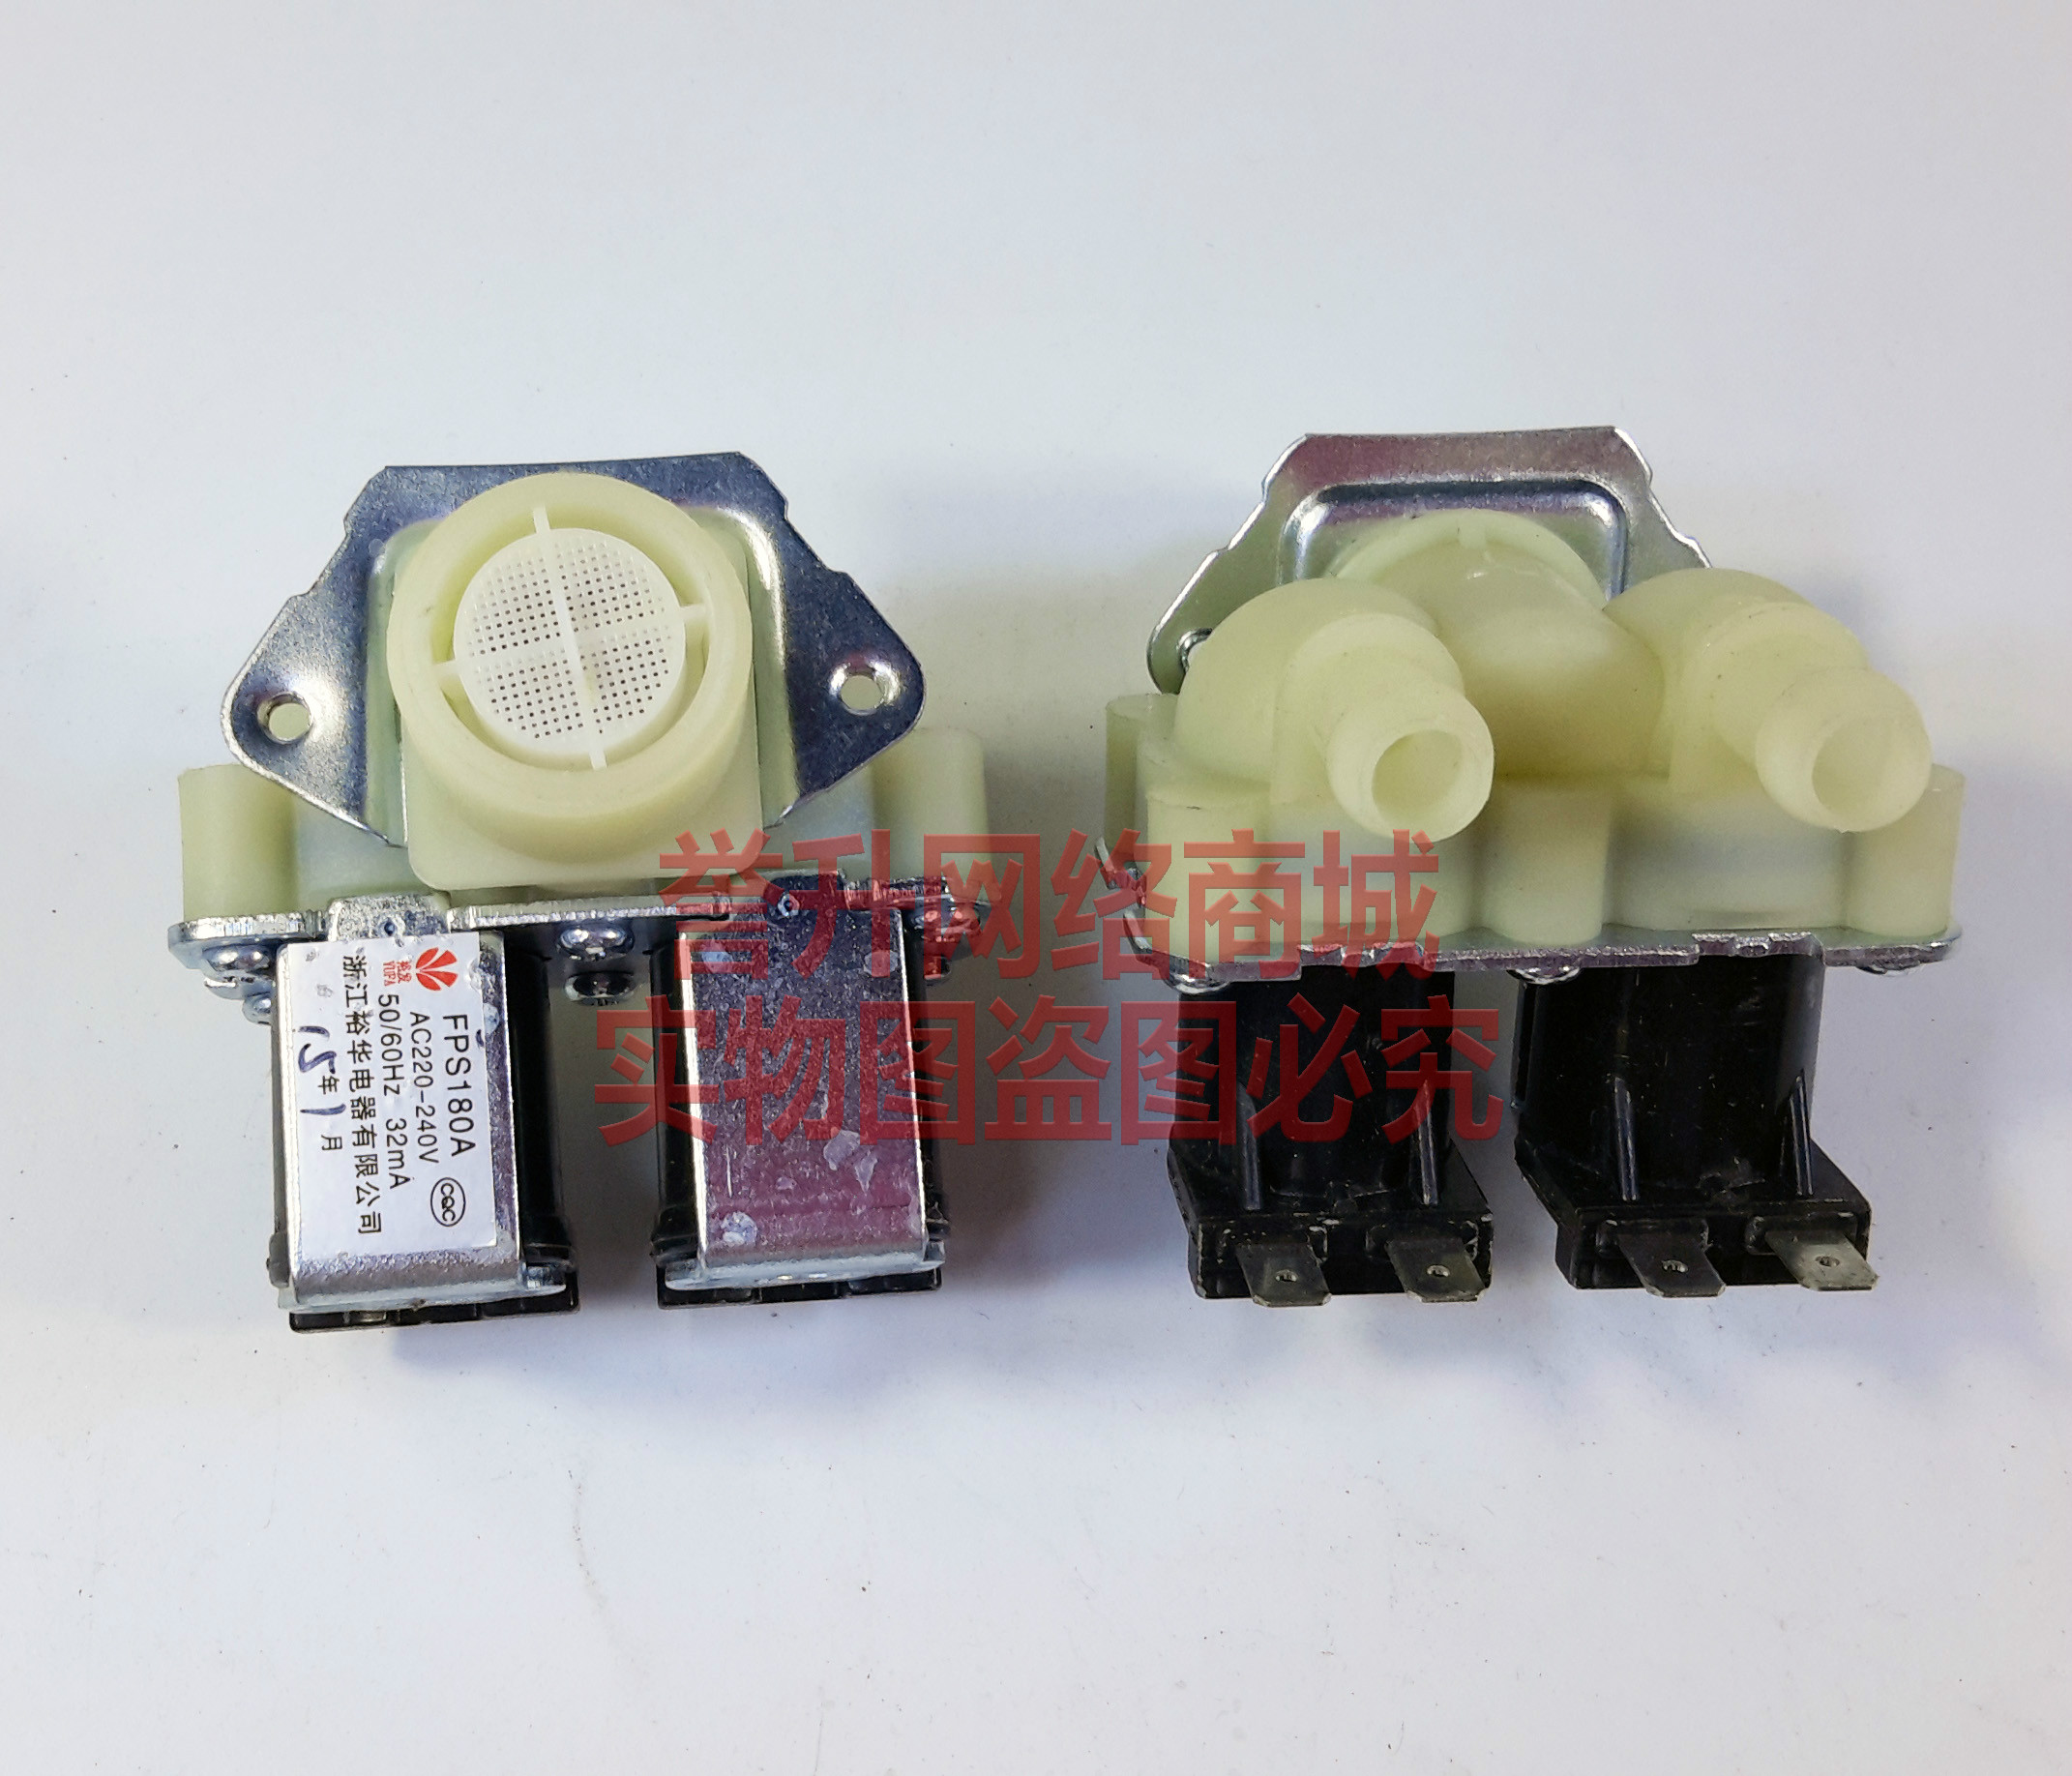 220v电源挅�.��kh�^k9P_洗衣机双嘴进水阀220v交流电源